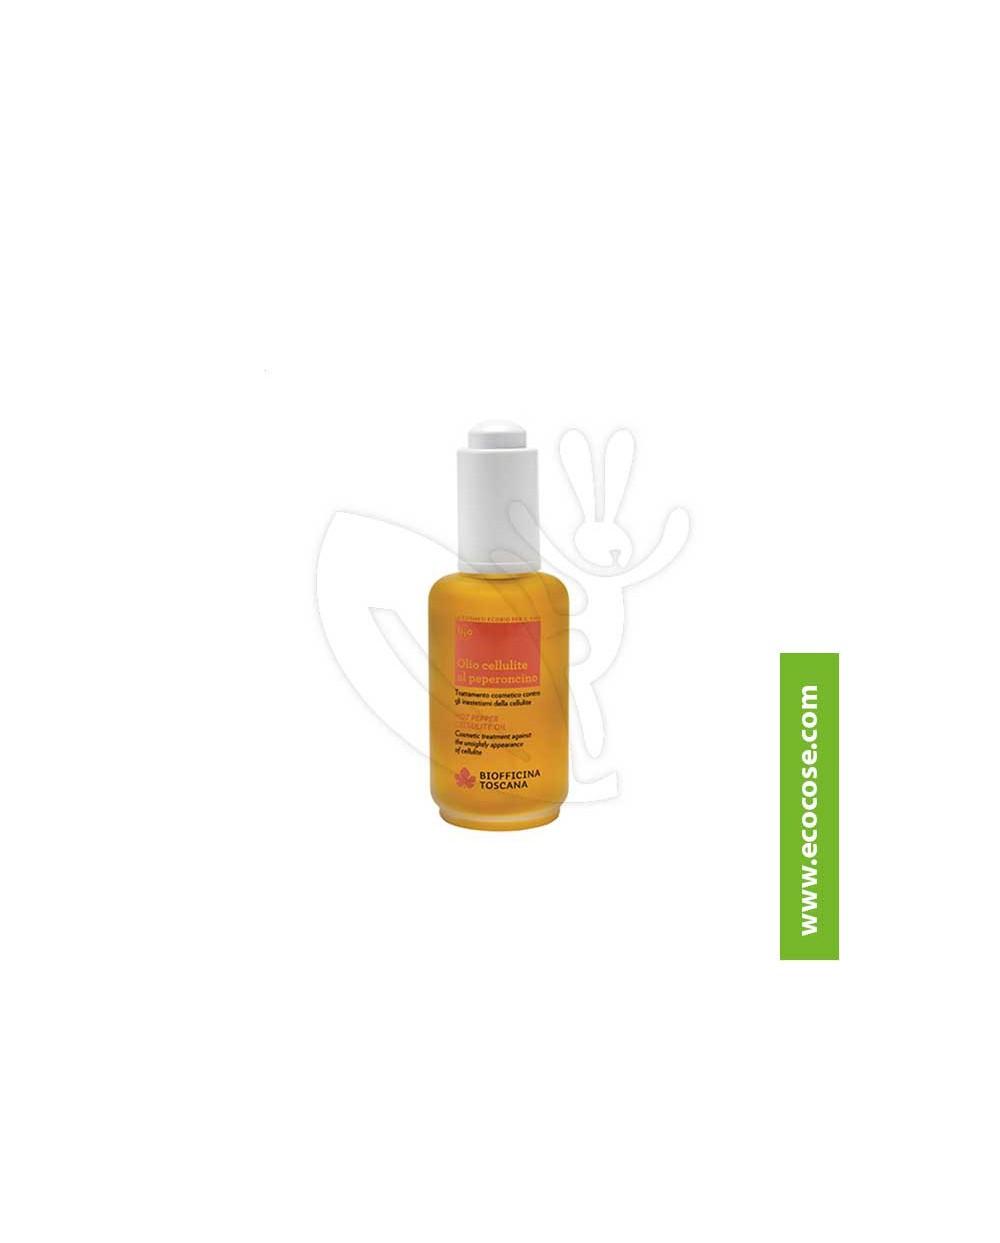 Biofficina Toscana - Olio cellulite al peperoncino